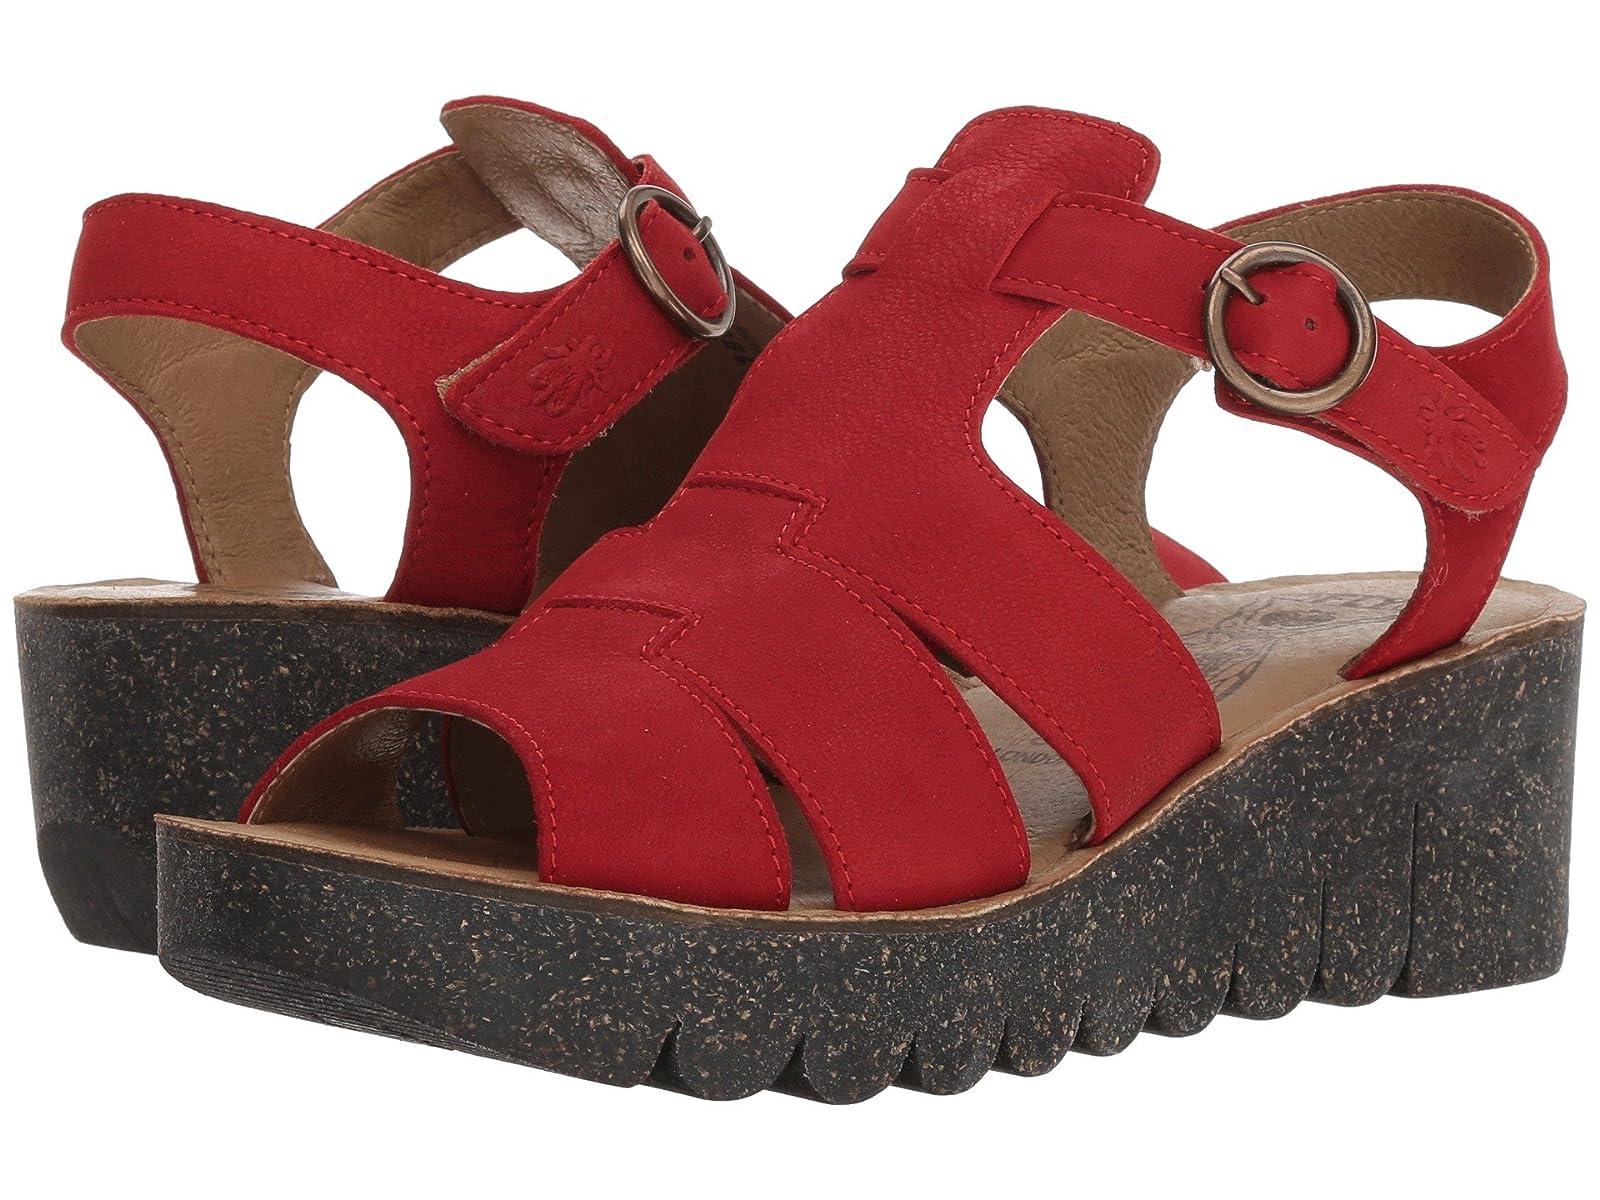 FLY LONDON YUNI188FLYCheap and distinctive eye-catching shoes